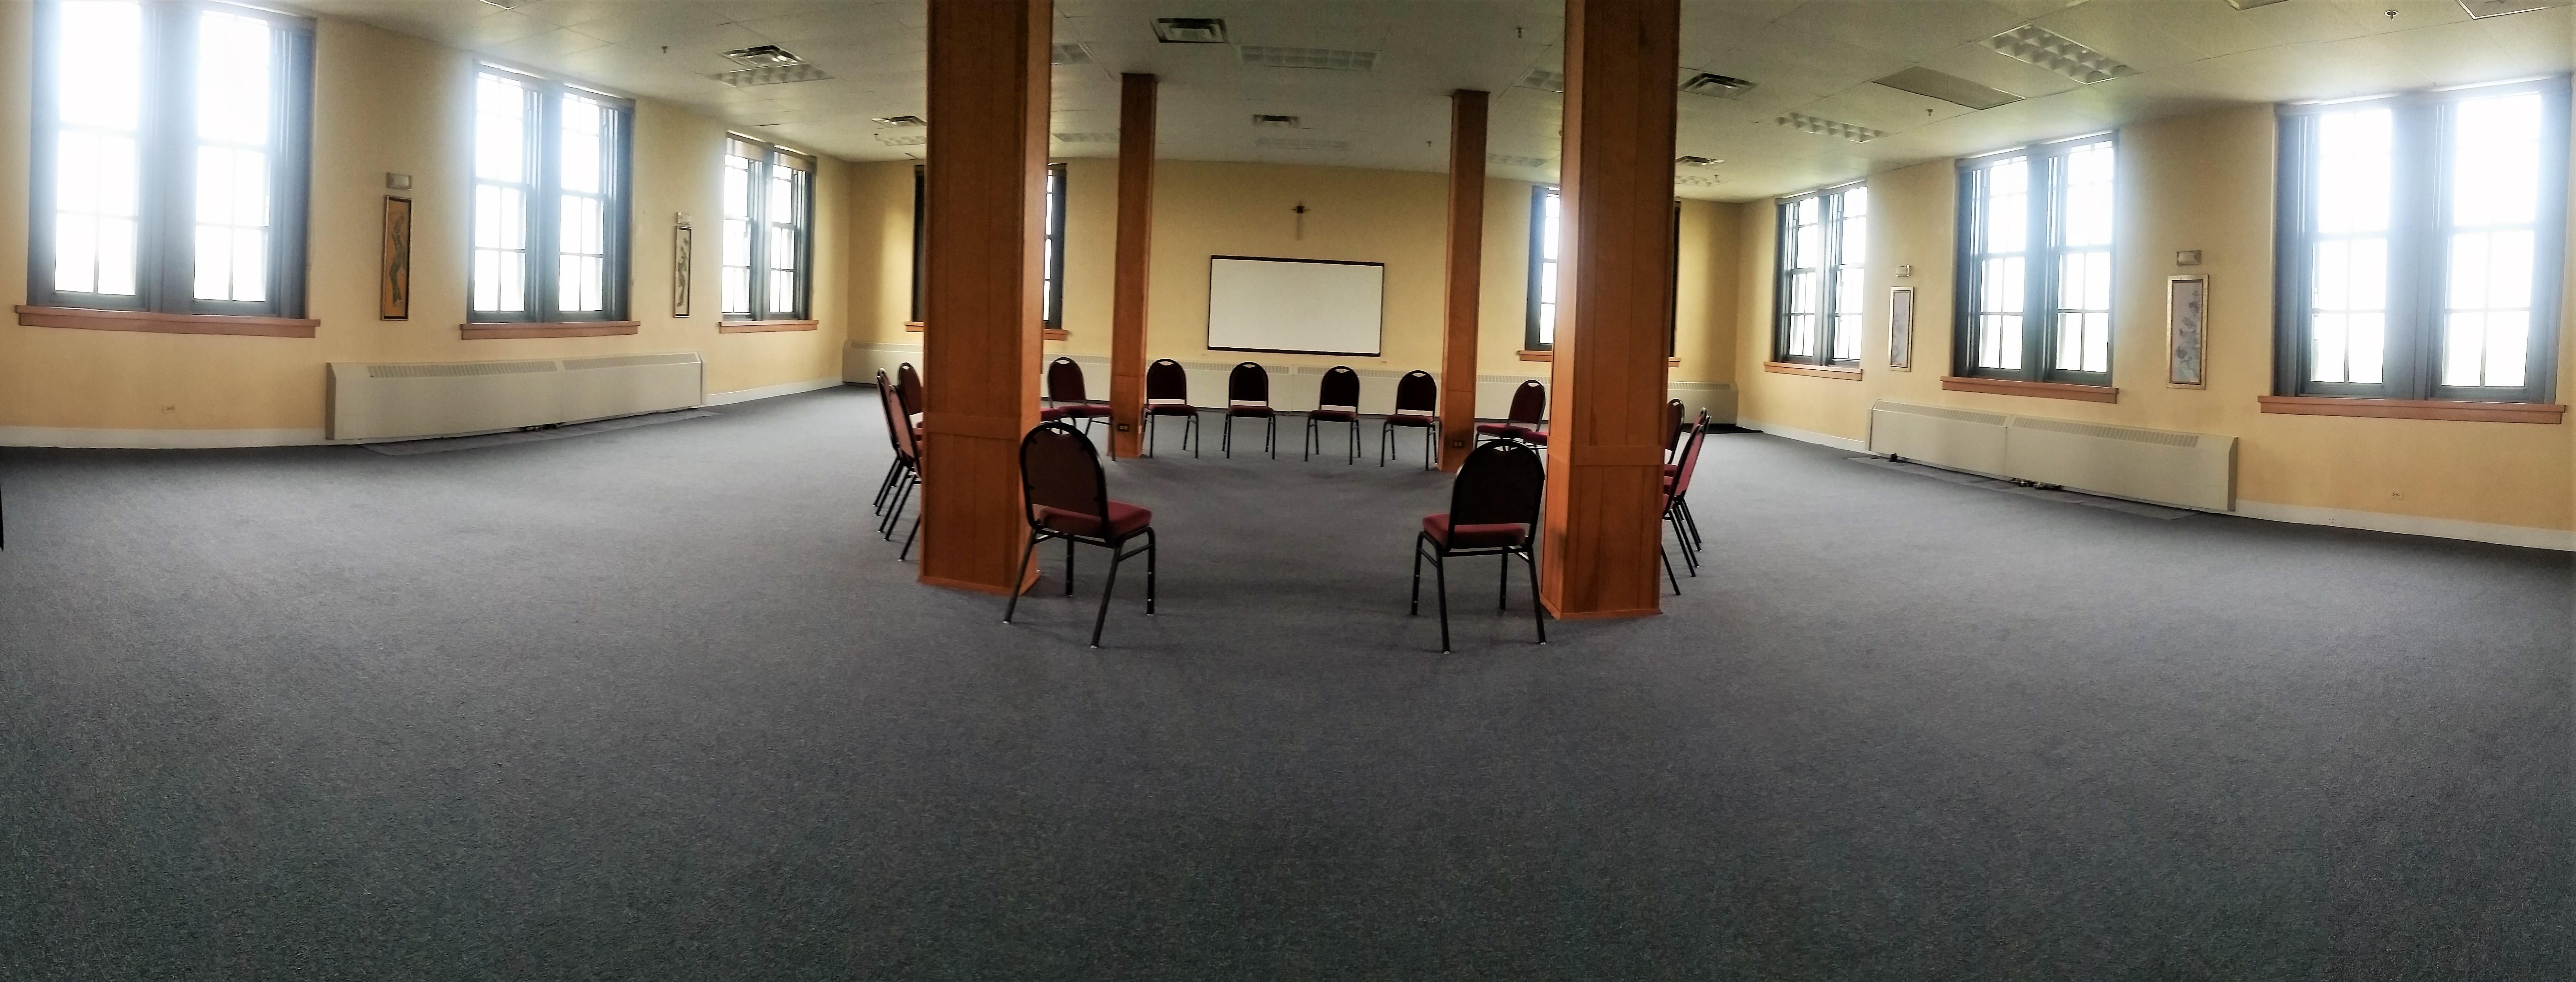 4th Floor Meeting Room03